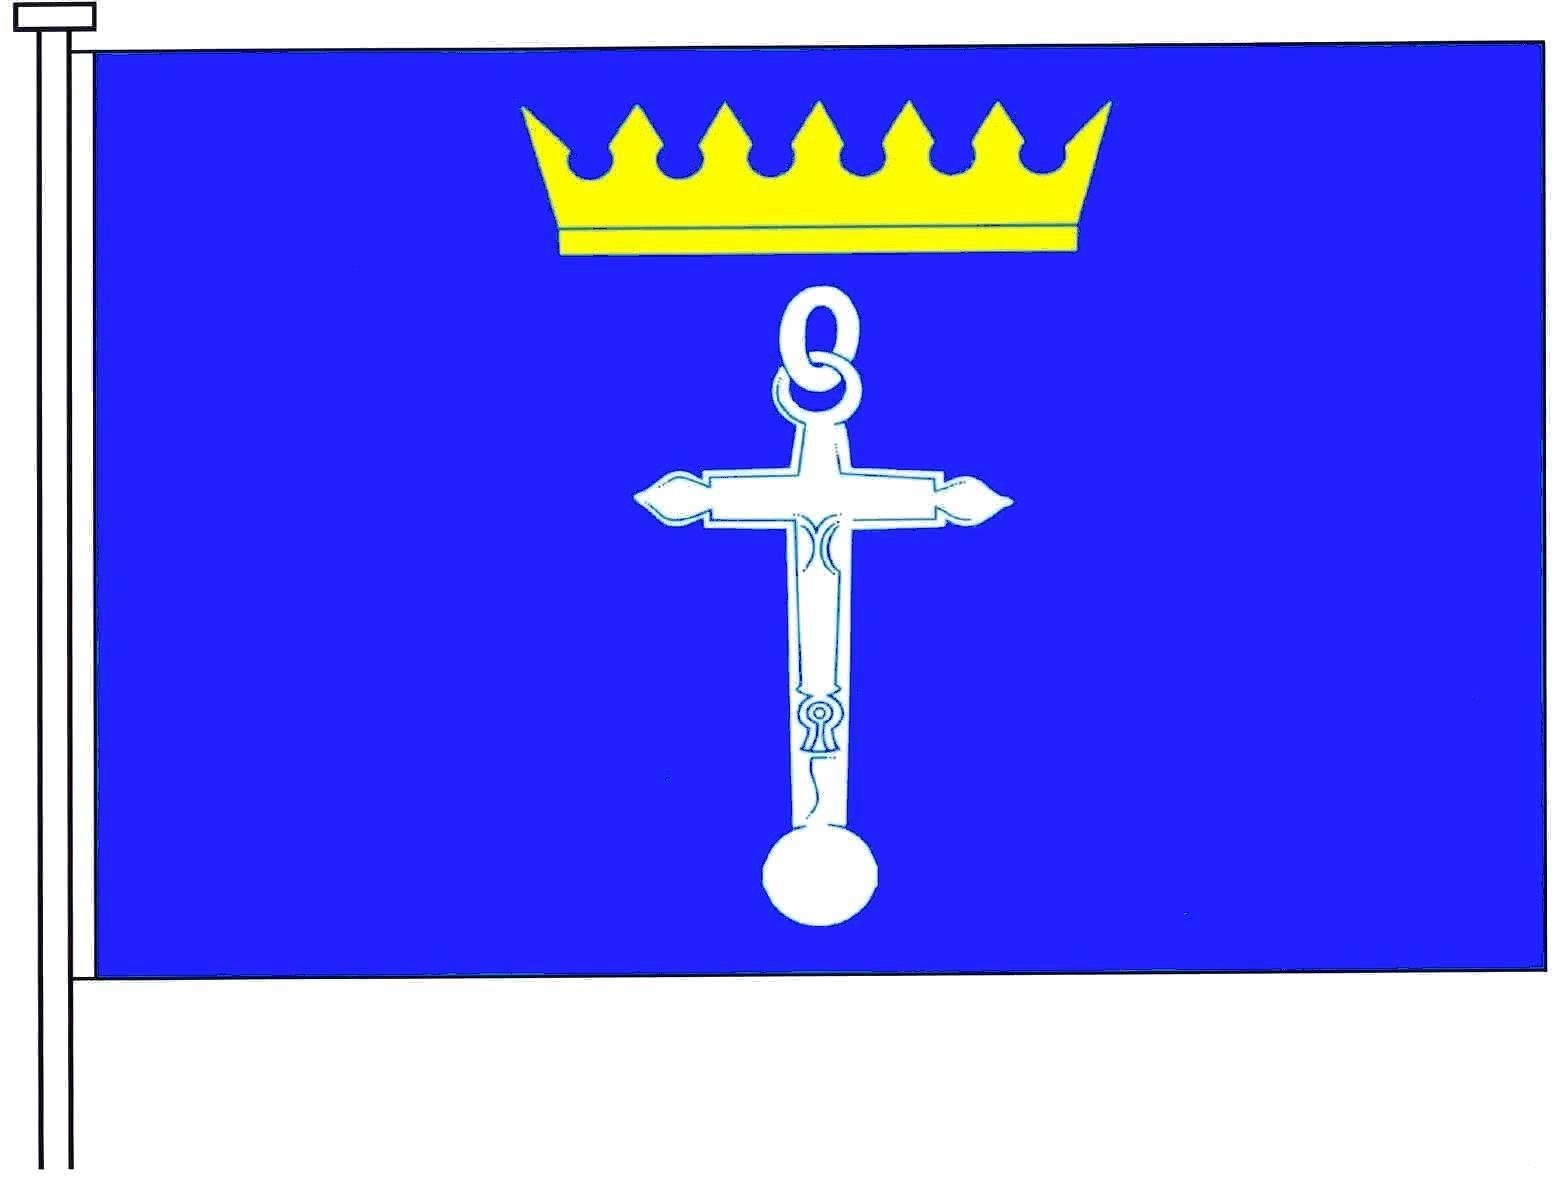 Flagge GemeindeKronsgaard, Kreis Schleswig-Flensburg